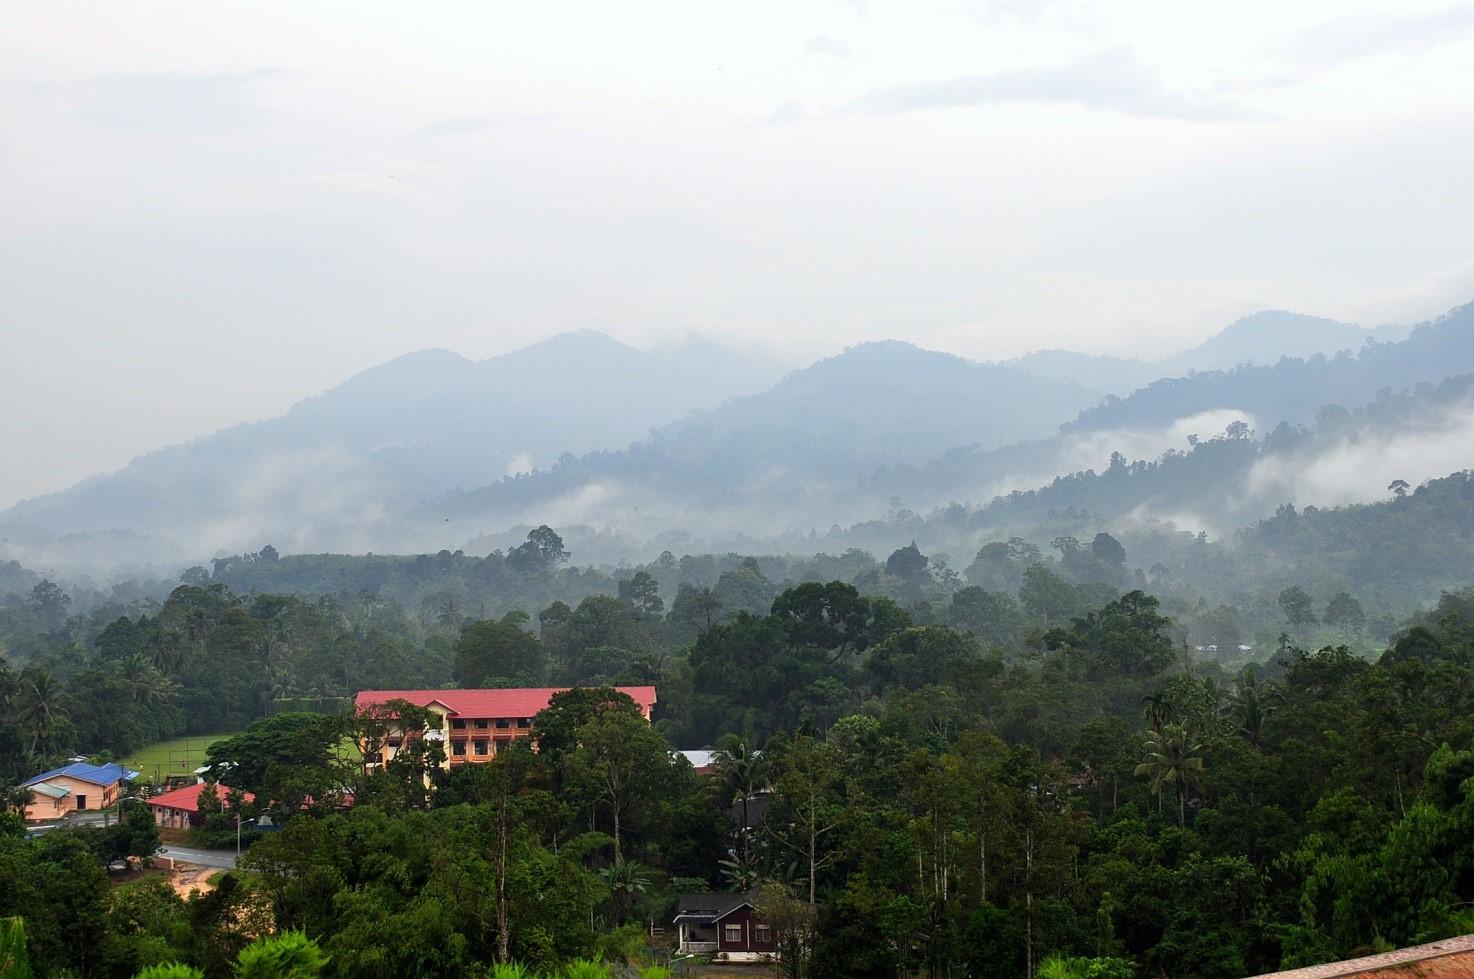 A view of the misty Banjaran Titiwangsa from Janda Baik in the early morning